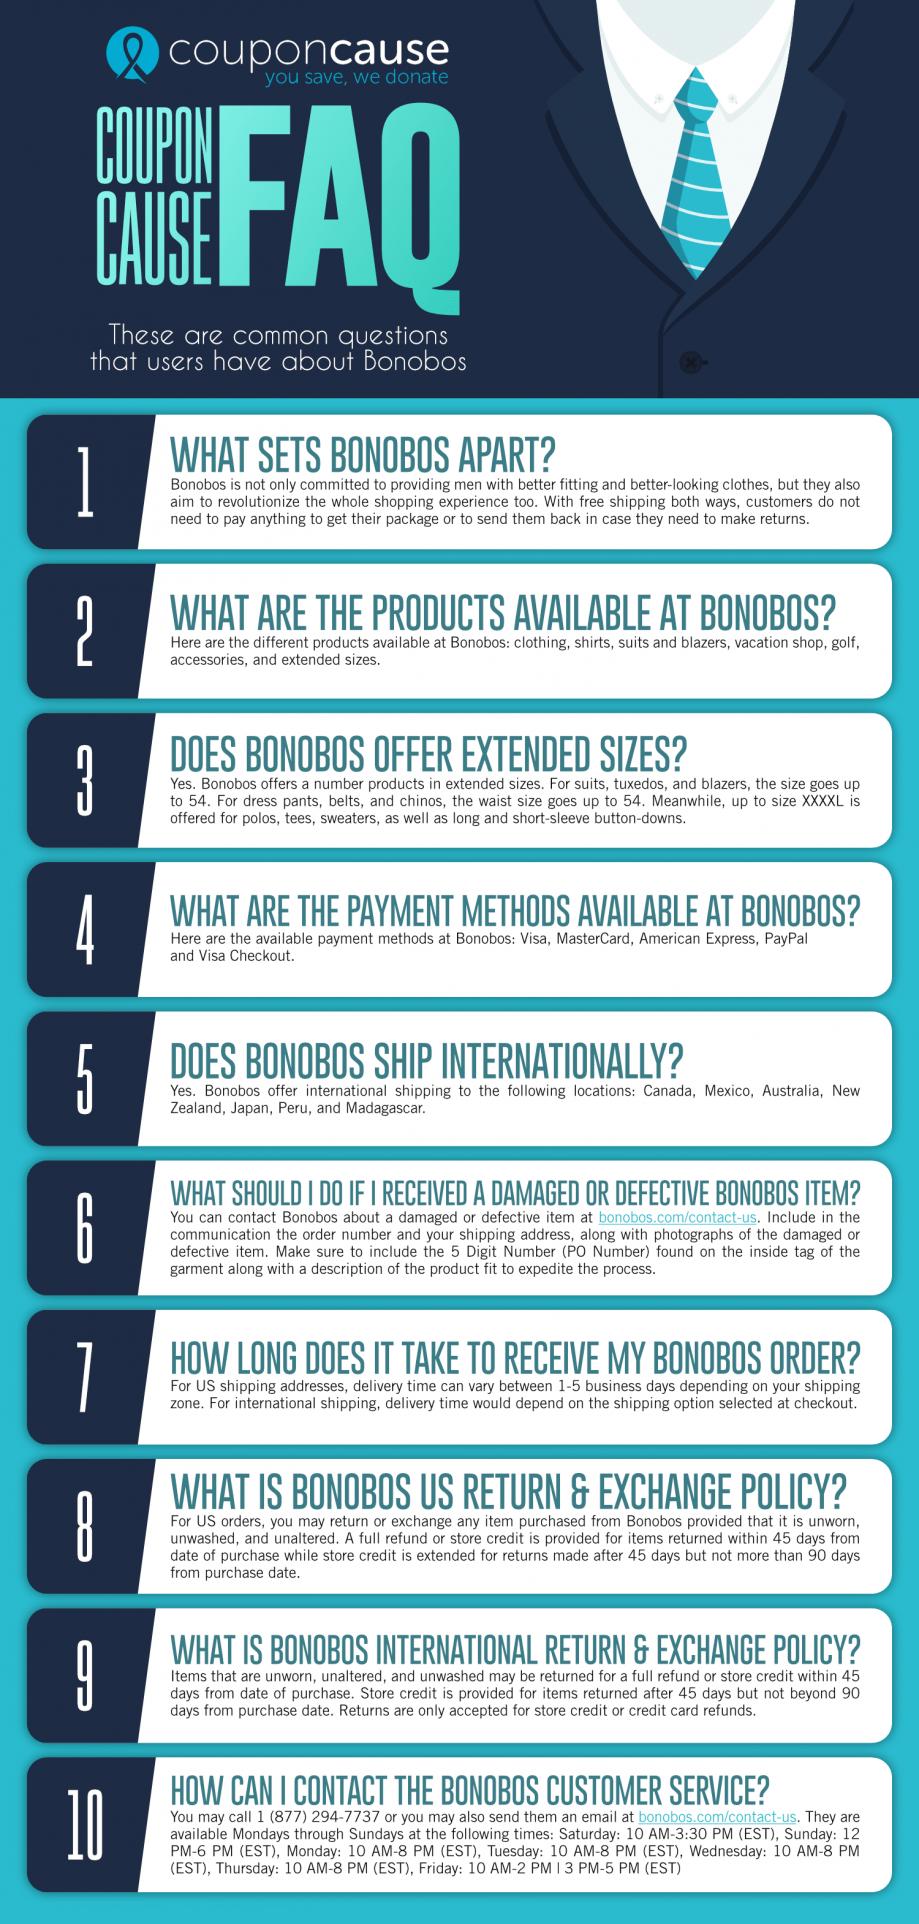 Bonobos Coupon Cause FAQ (C.C. FAQ)